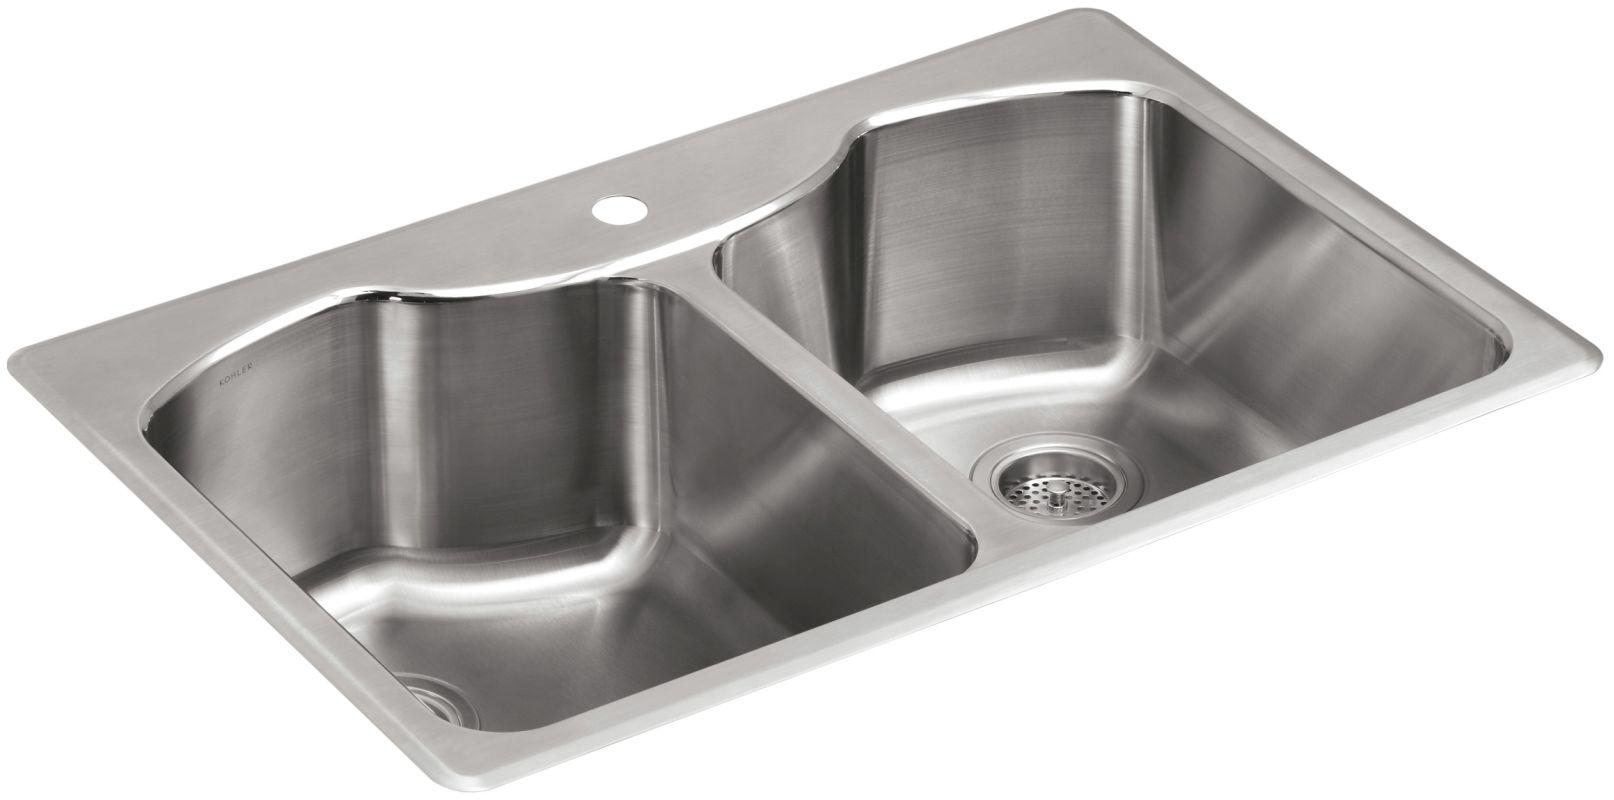 K-3842-1-NA In Stainless Steel By Kohler